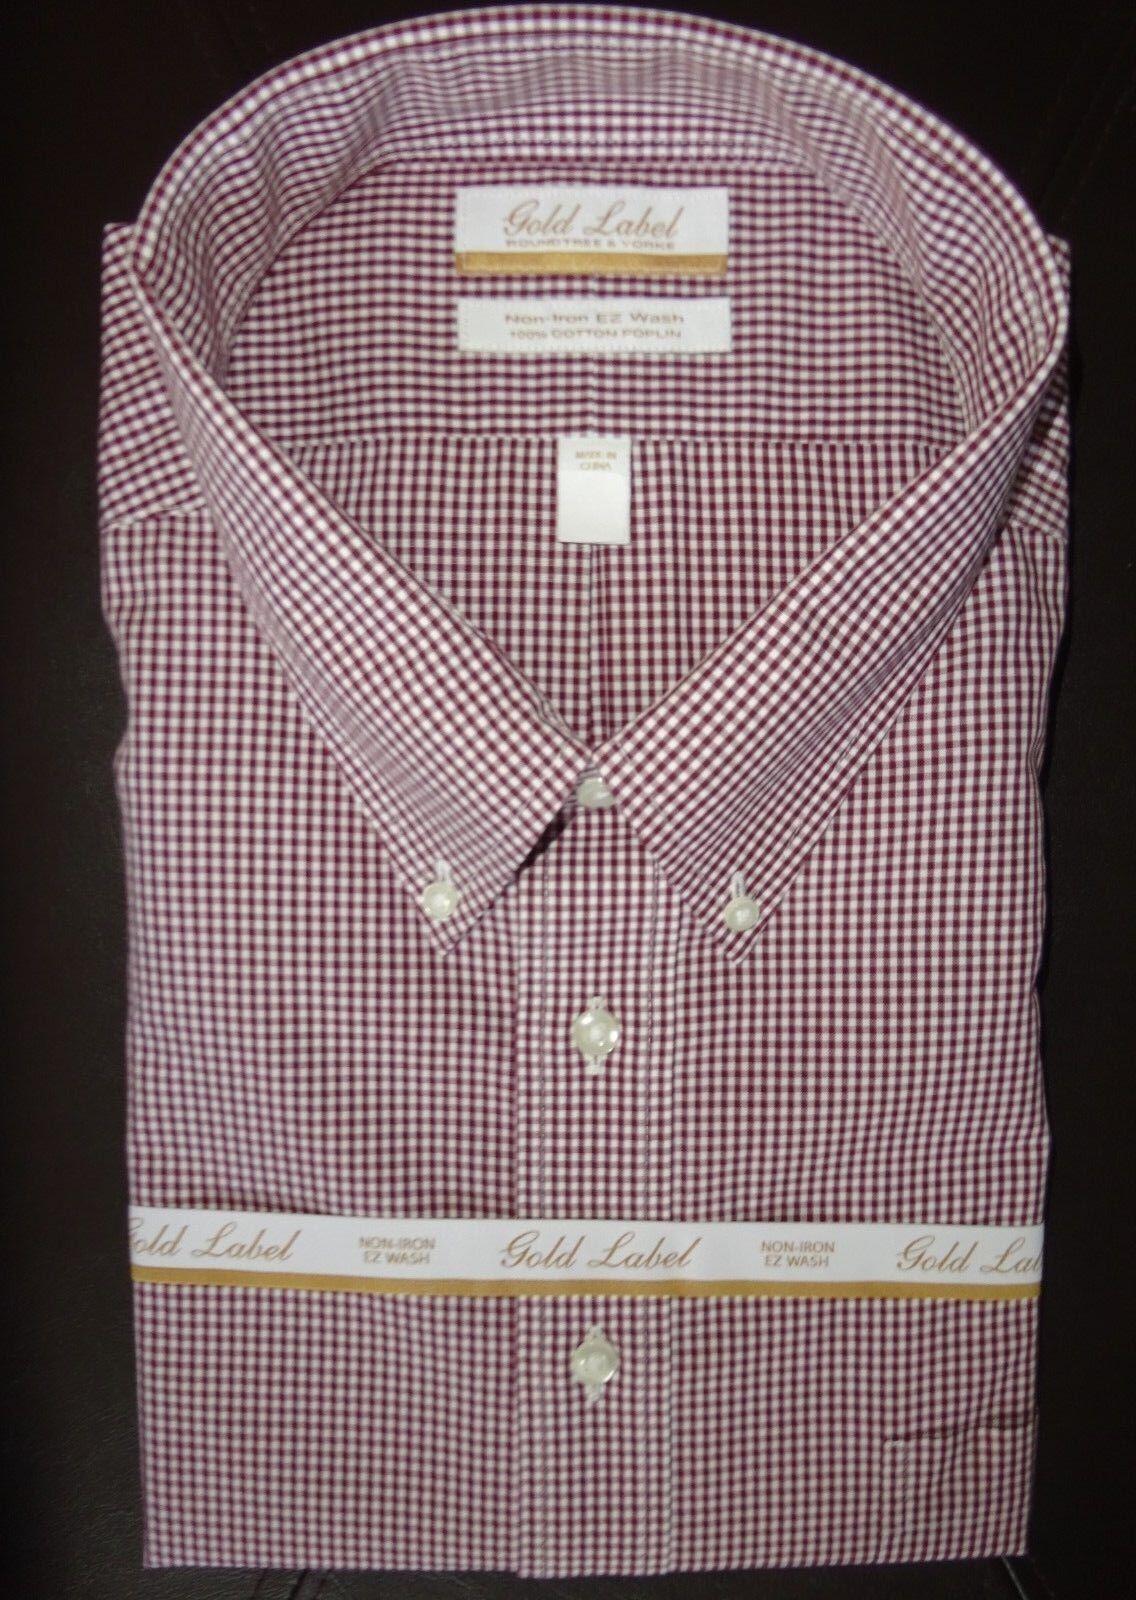 Roundtree Yorke Dress Shirt  Burgundy Gingham Pattern 18.5 - 36 37 BIG - NWT